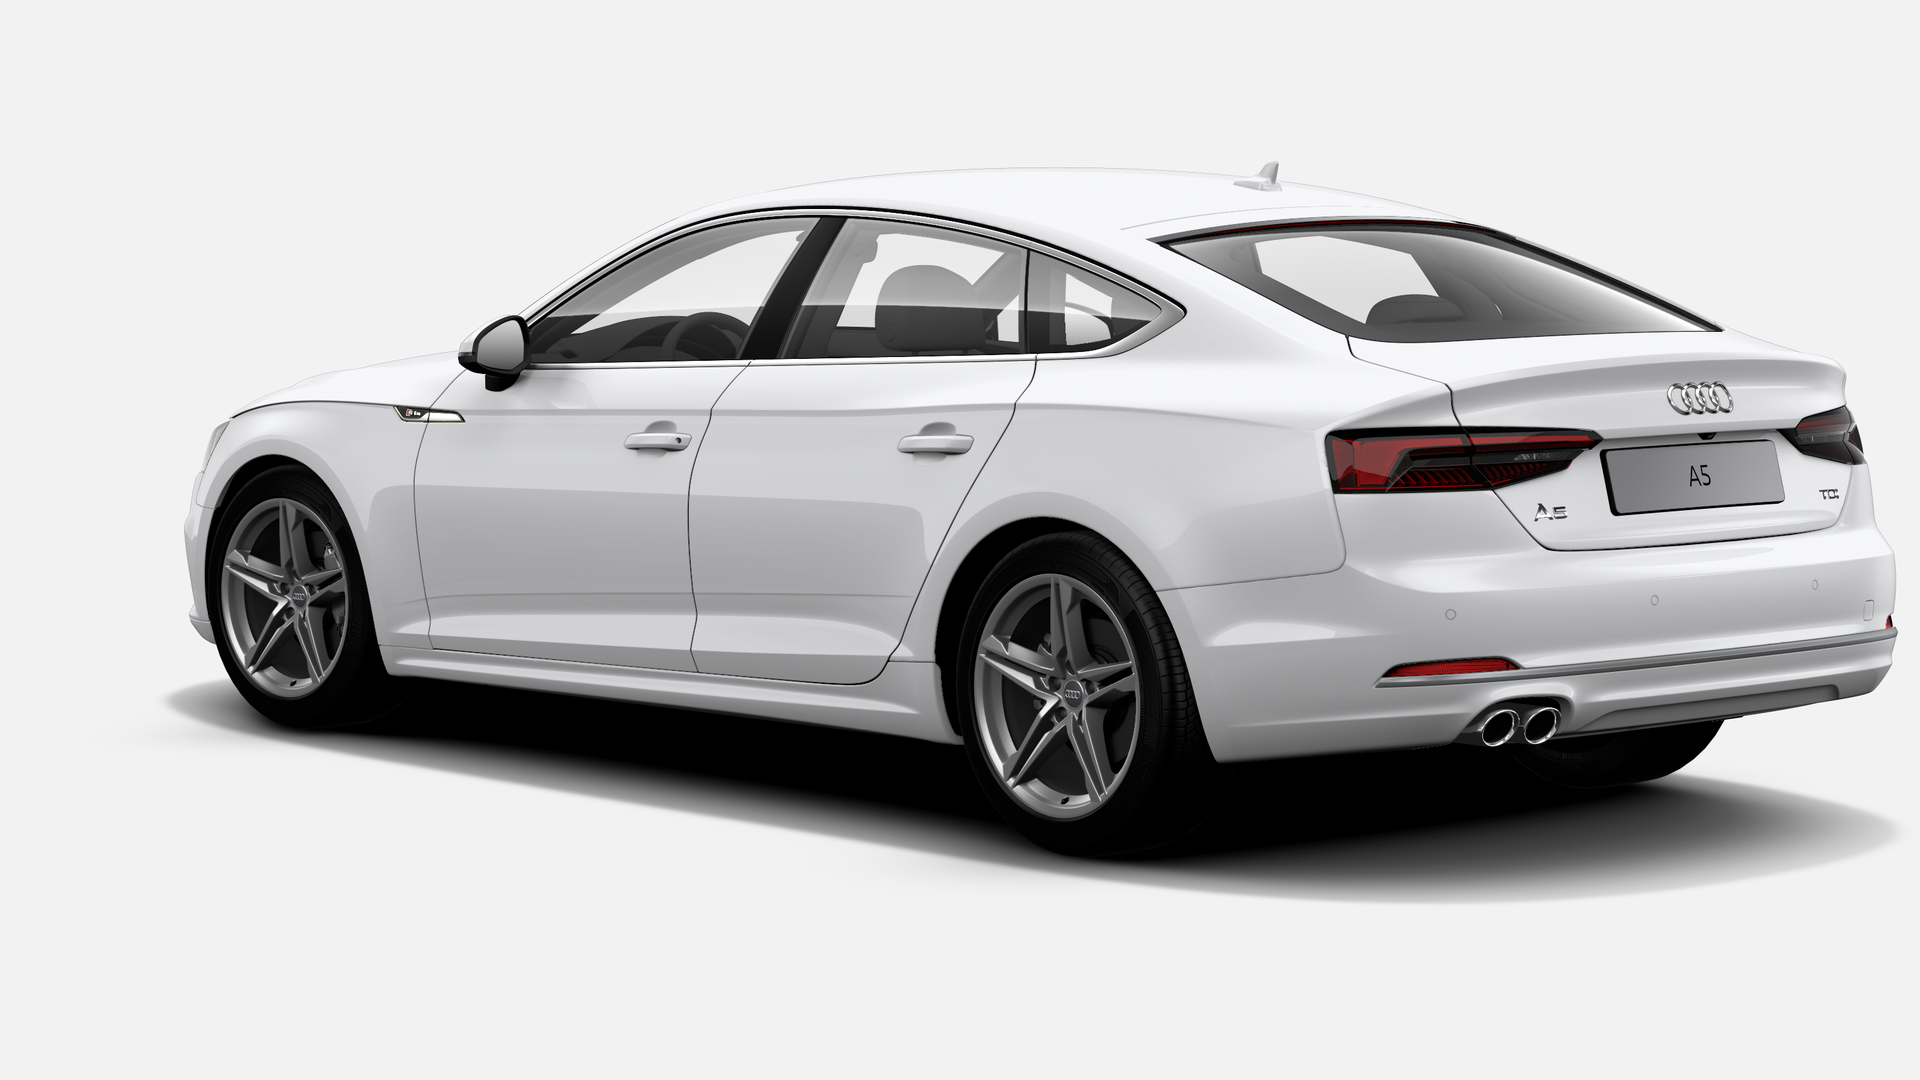 Vista Tres cuartos trasera izquierda de Audi A5 Sportback 2.0 TDI Sport S tronic 140 kW (190 CV)